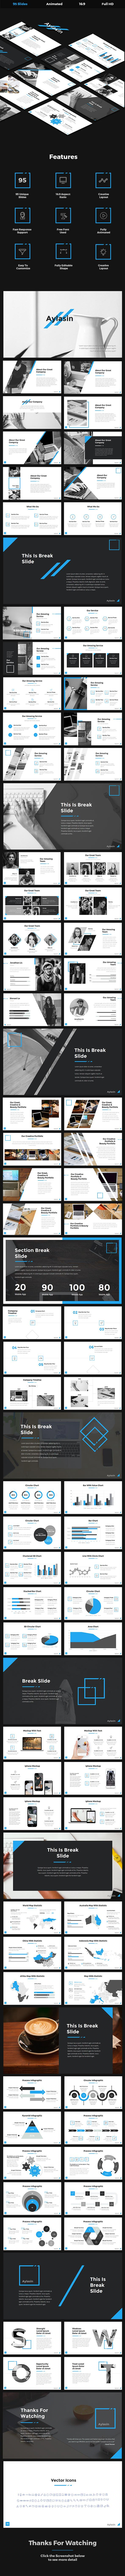 Aylasin - Creative Google Slides Template - Google Slides Presentation Templates